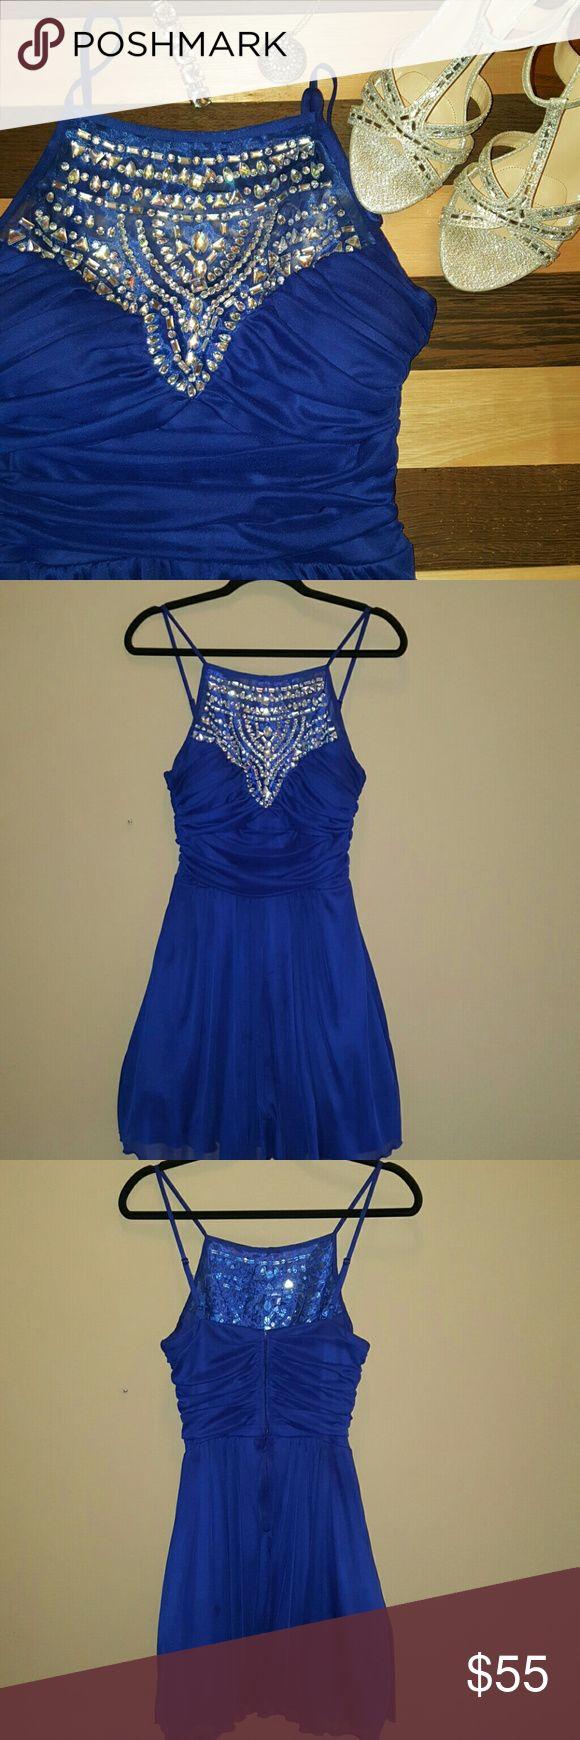 Weekend Sale Gorgeous Blue Dress worn one evening Gorgeous Blue Dress - Size 11/12 B Darlin Dresses Prom